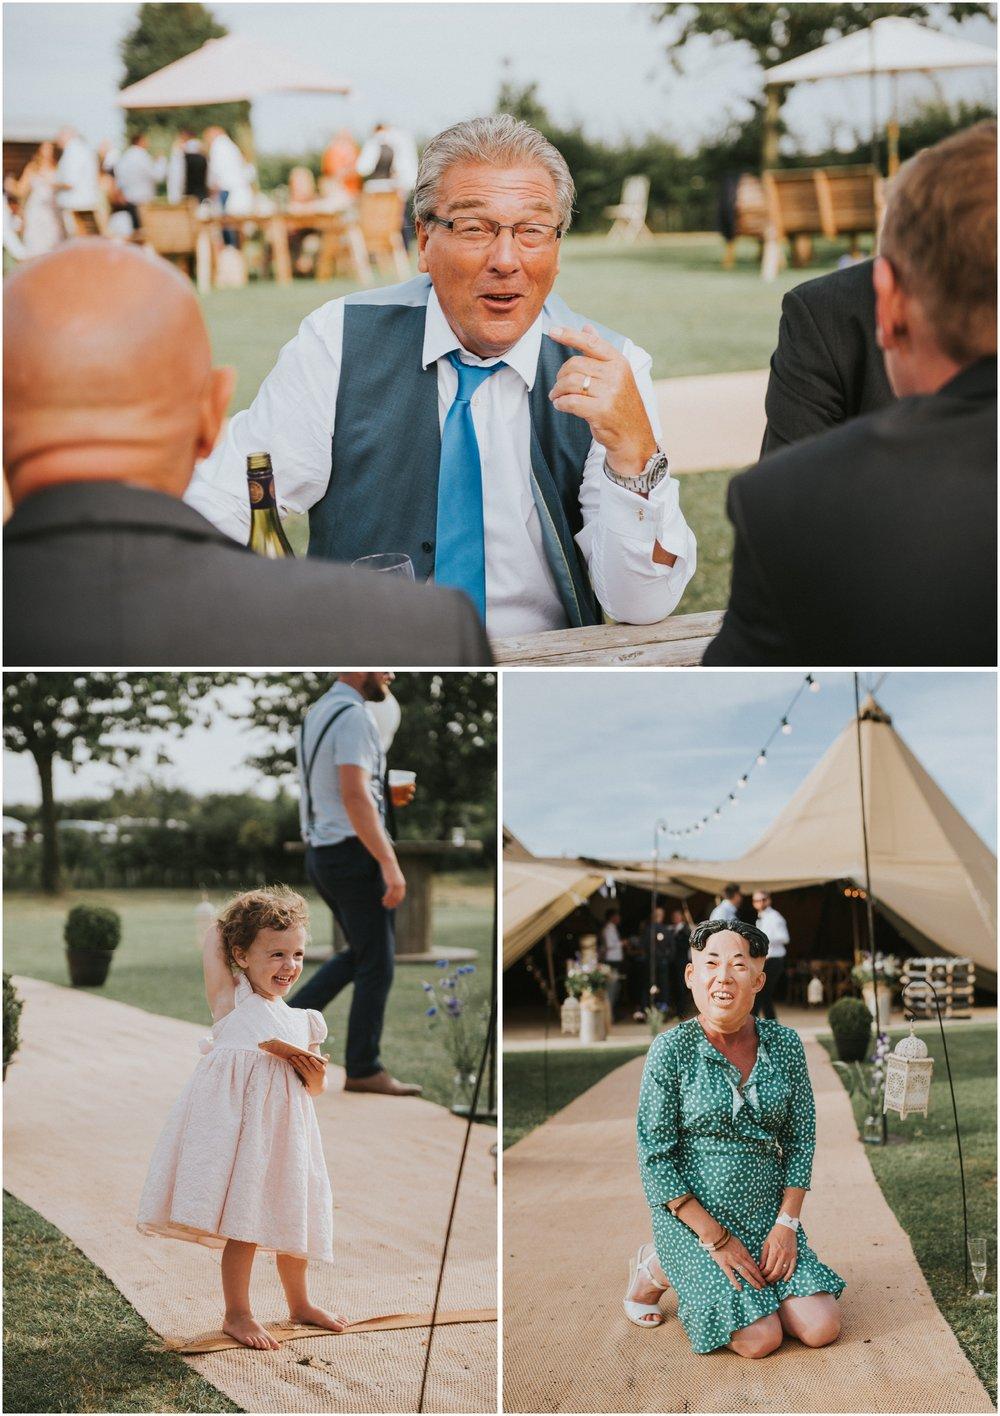 SkipbridegFarmWedding-LukeHolroyd-Yorkshirewedding_0127.jpg